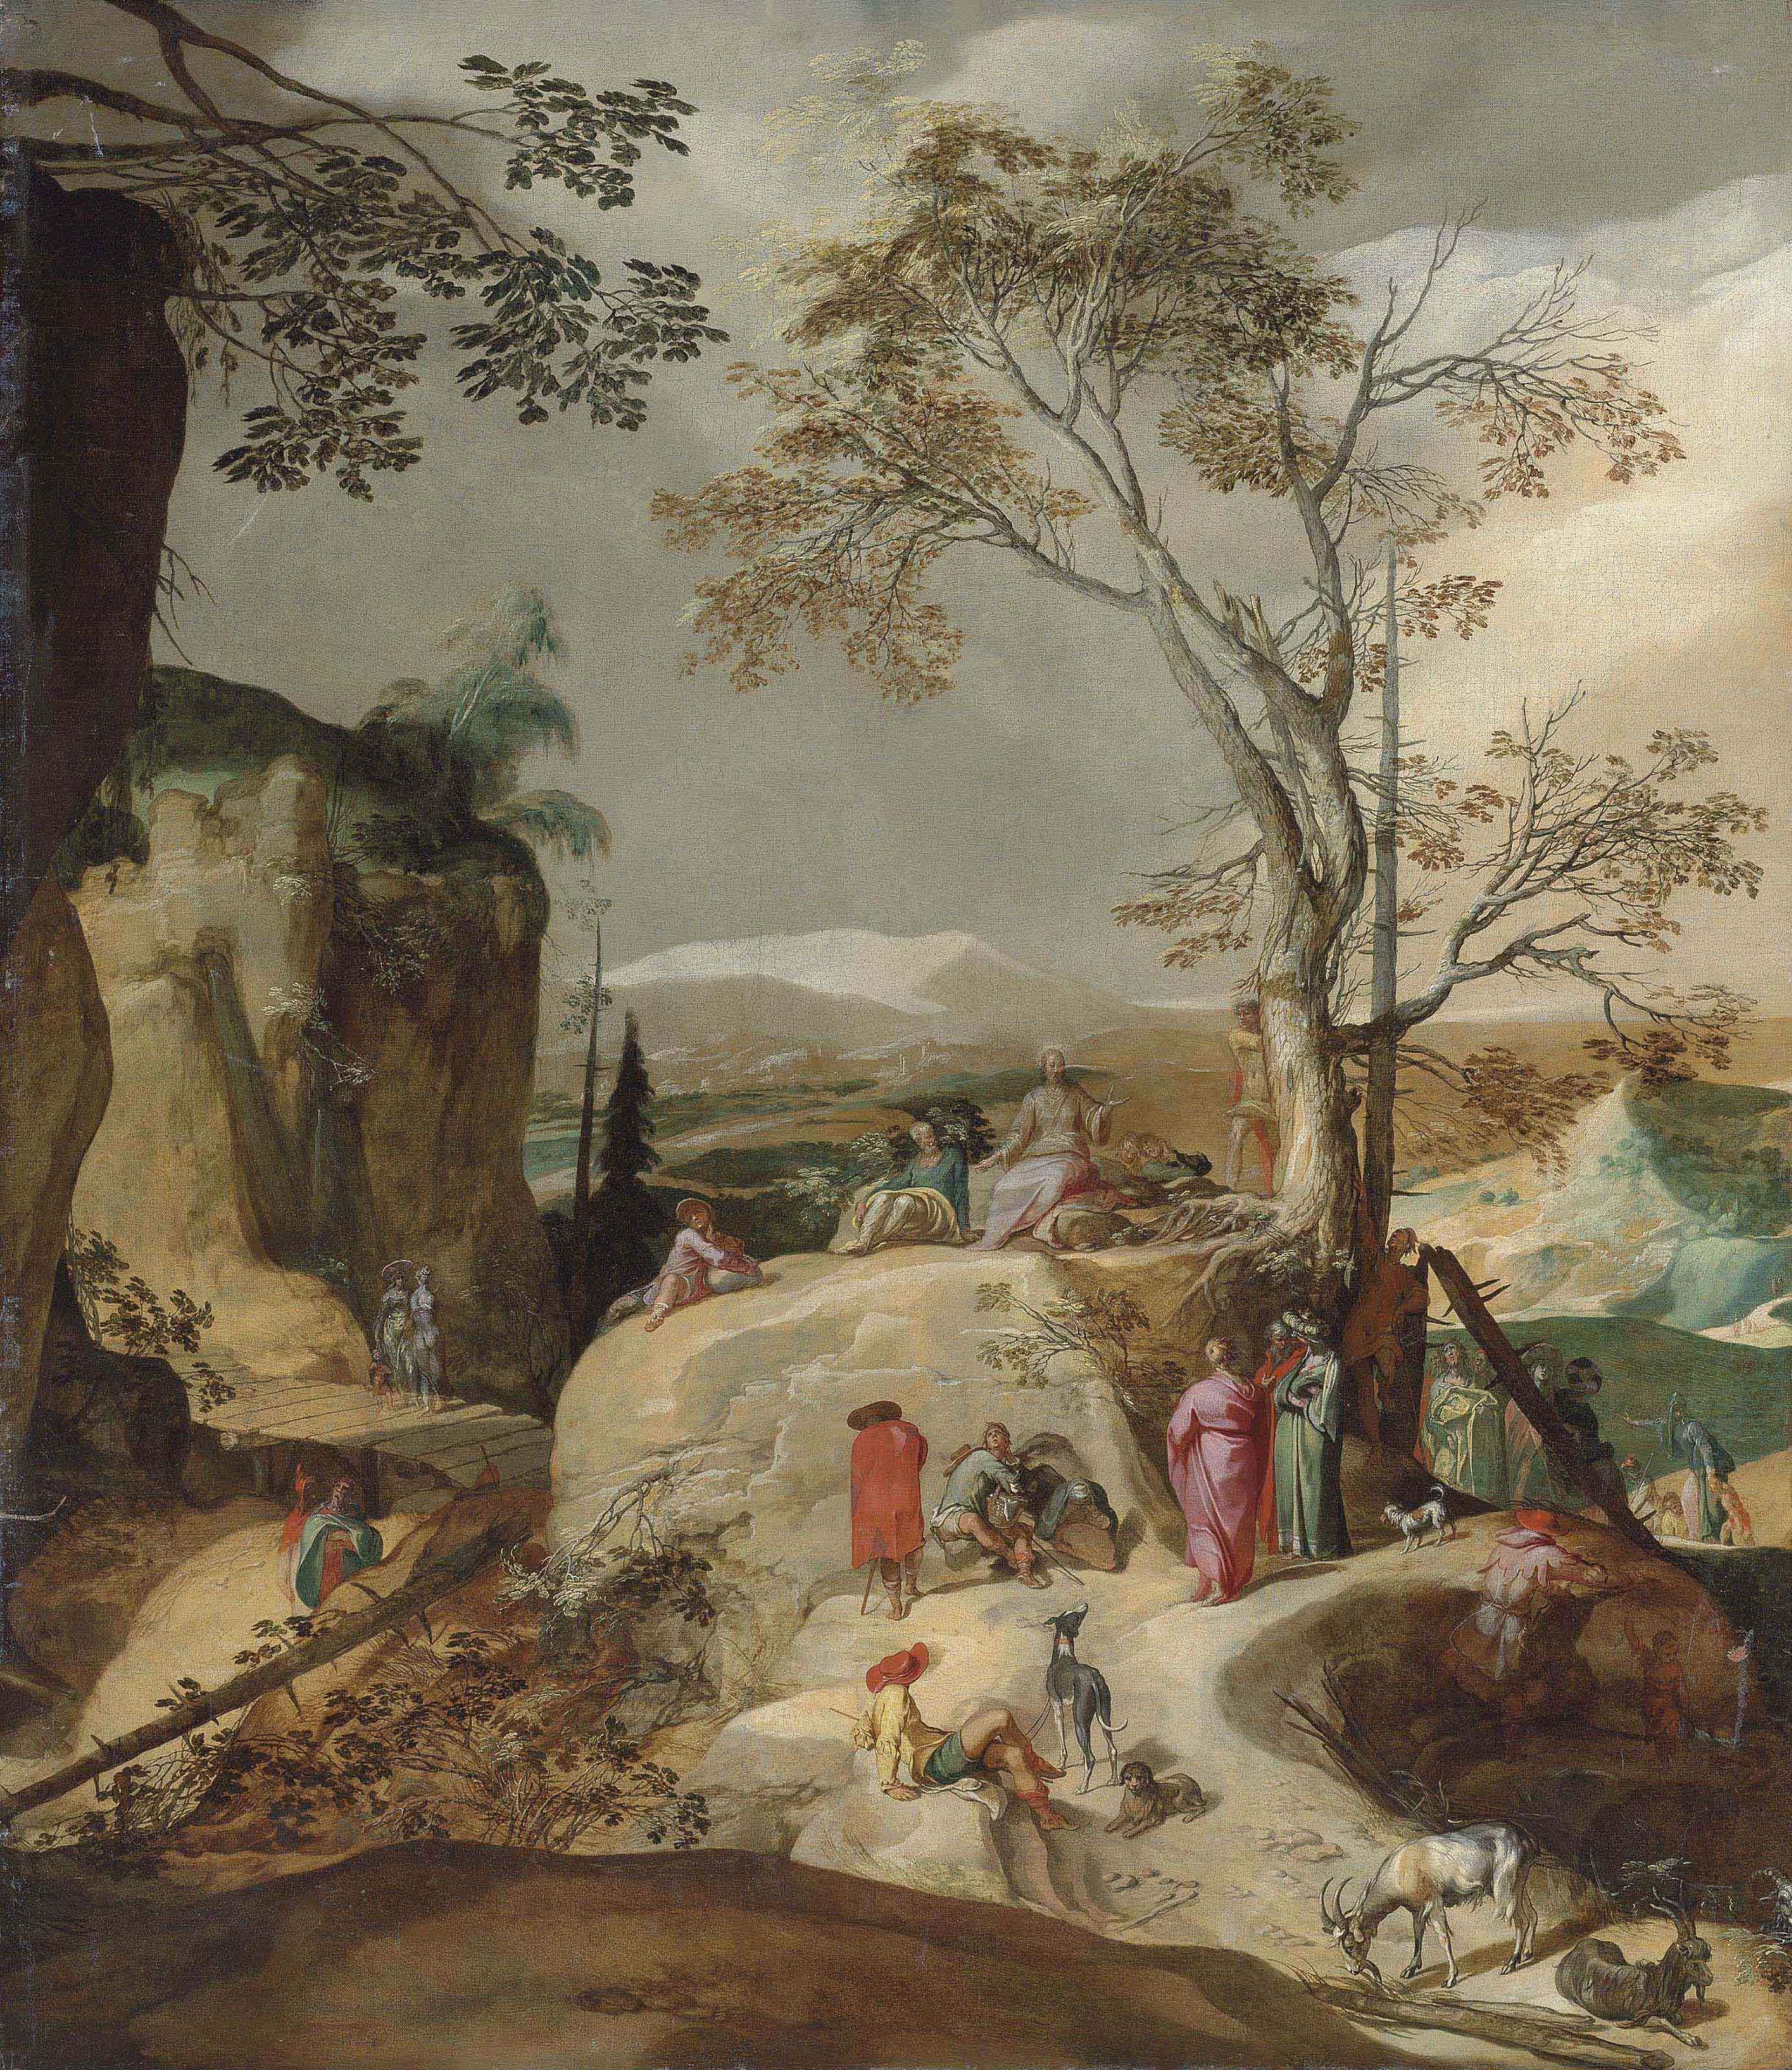 The Sermon on the Mount, a rocky landscape beyond